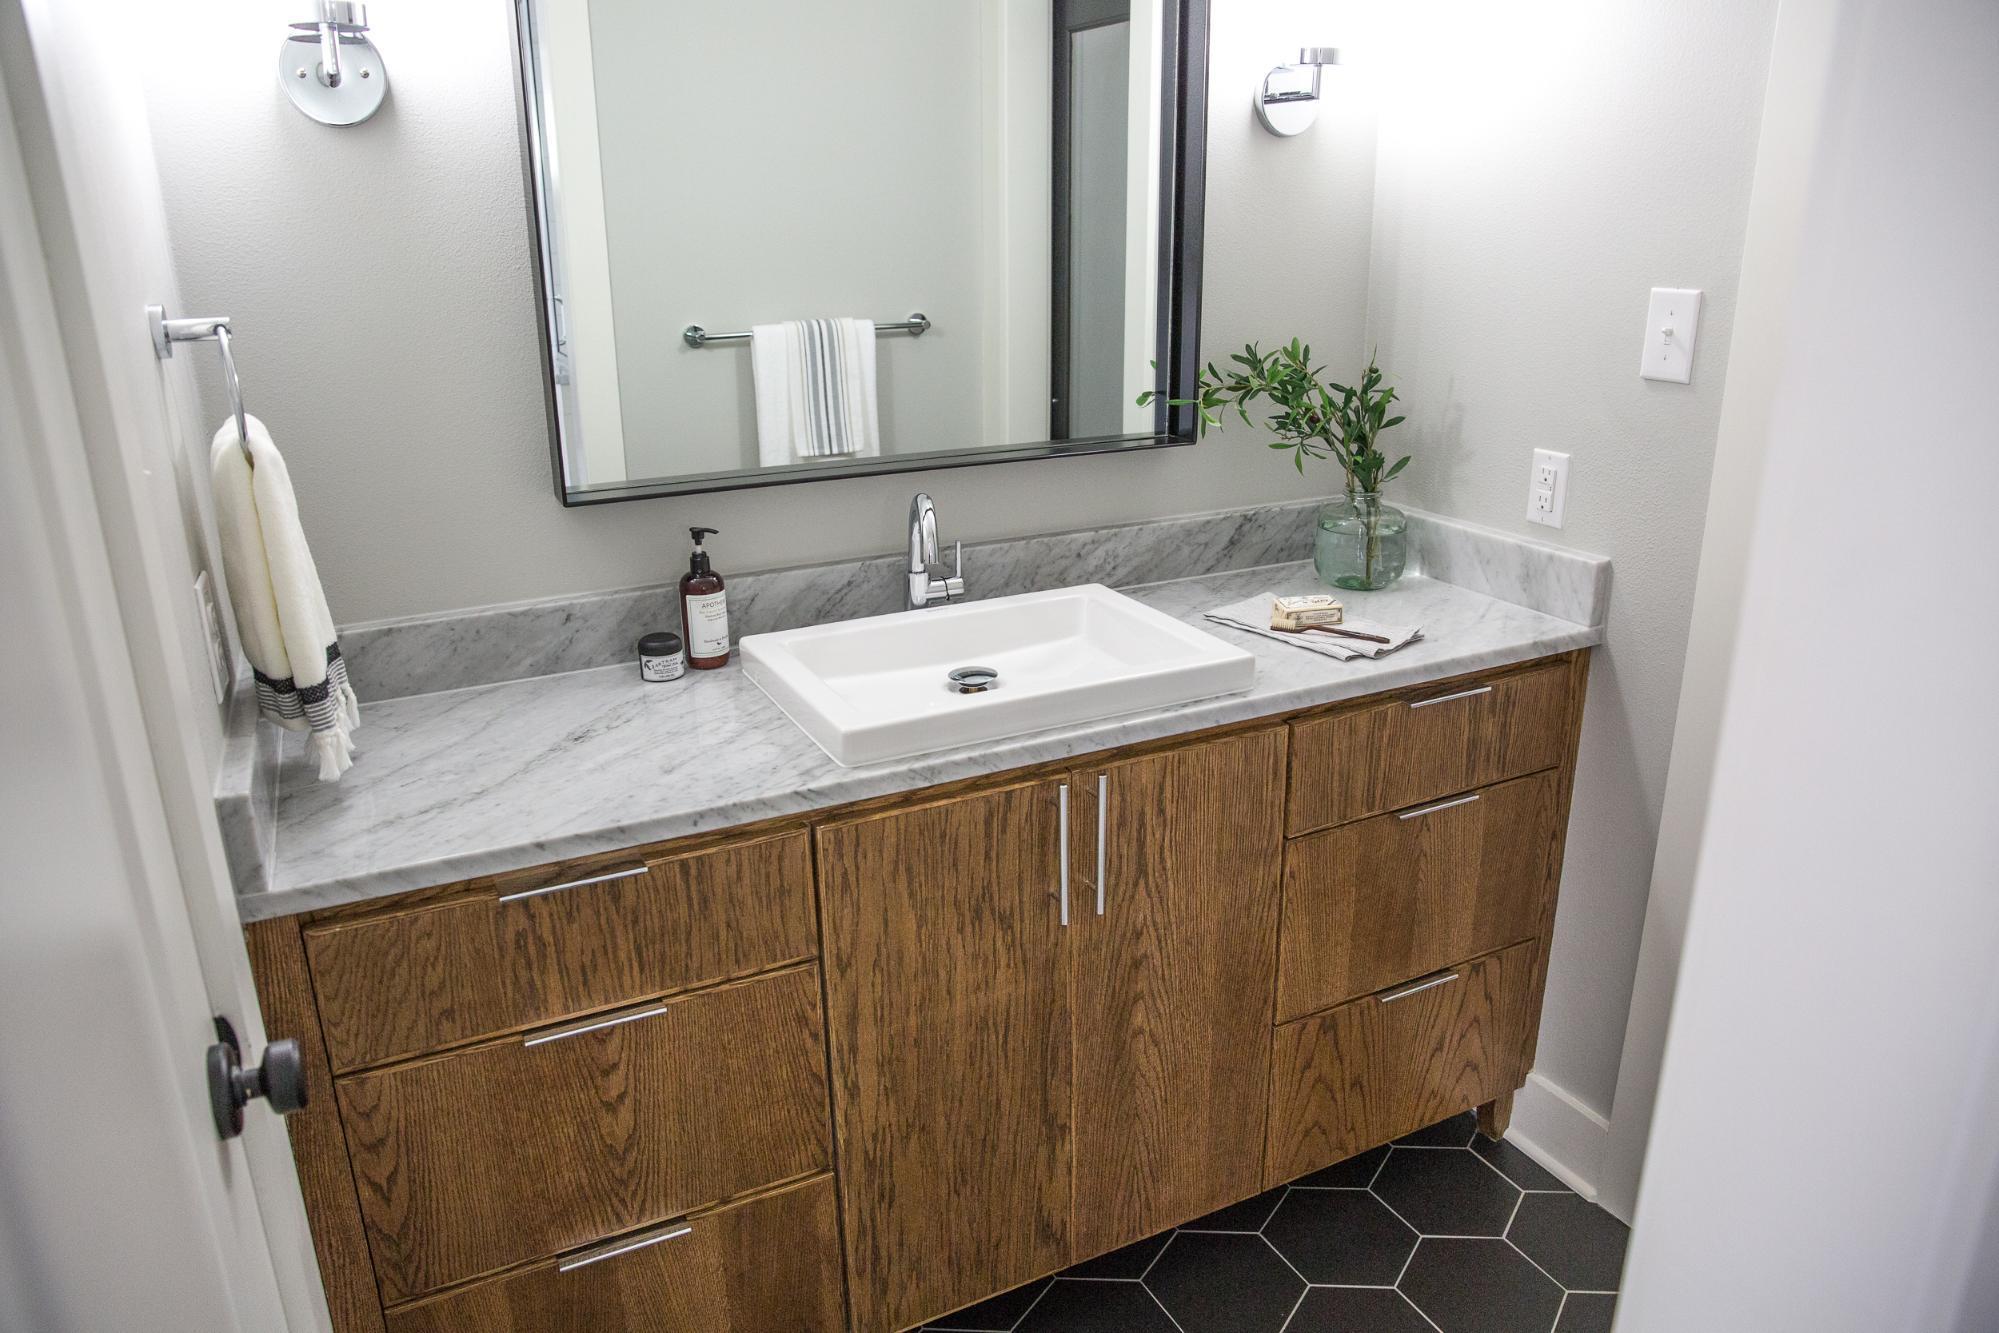 Fixer upper marble bathroom